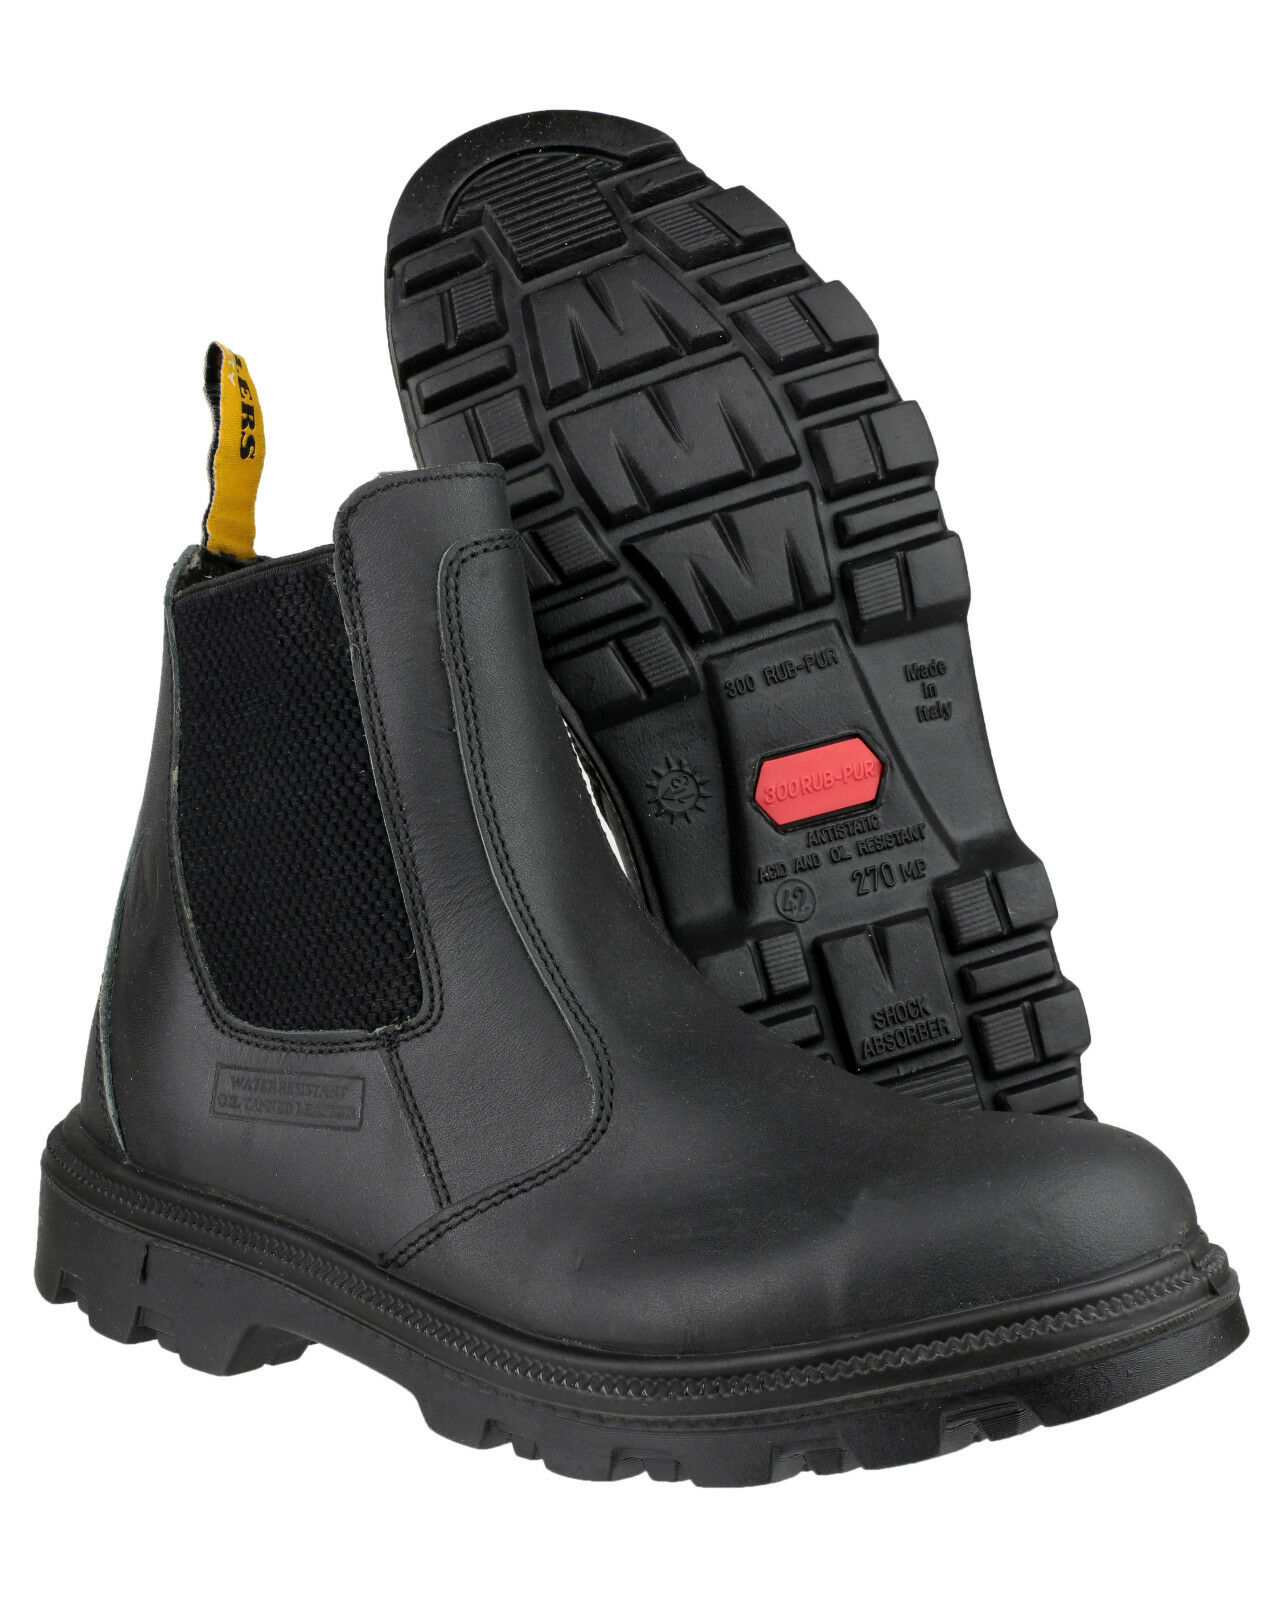 Amblers FS129 Safety Punta Acciaio Uomini Industriale shoes da Lavgold